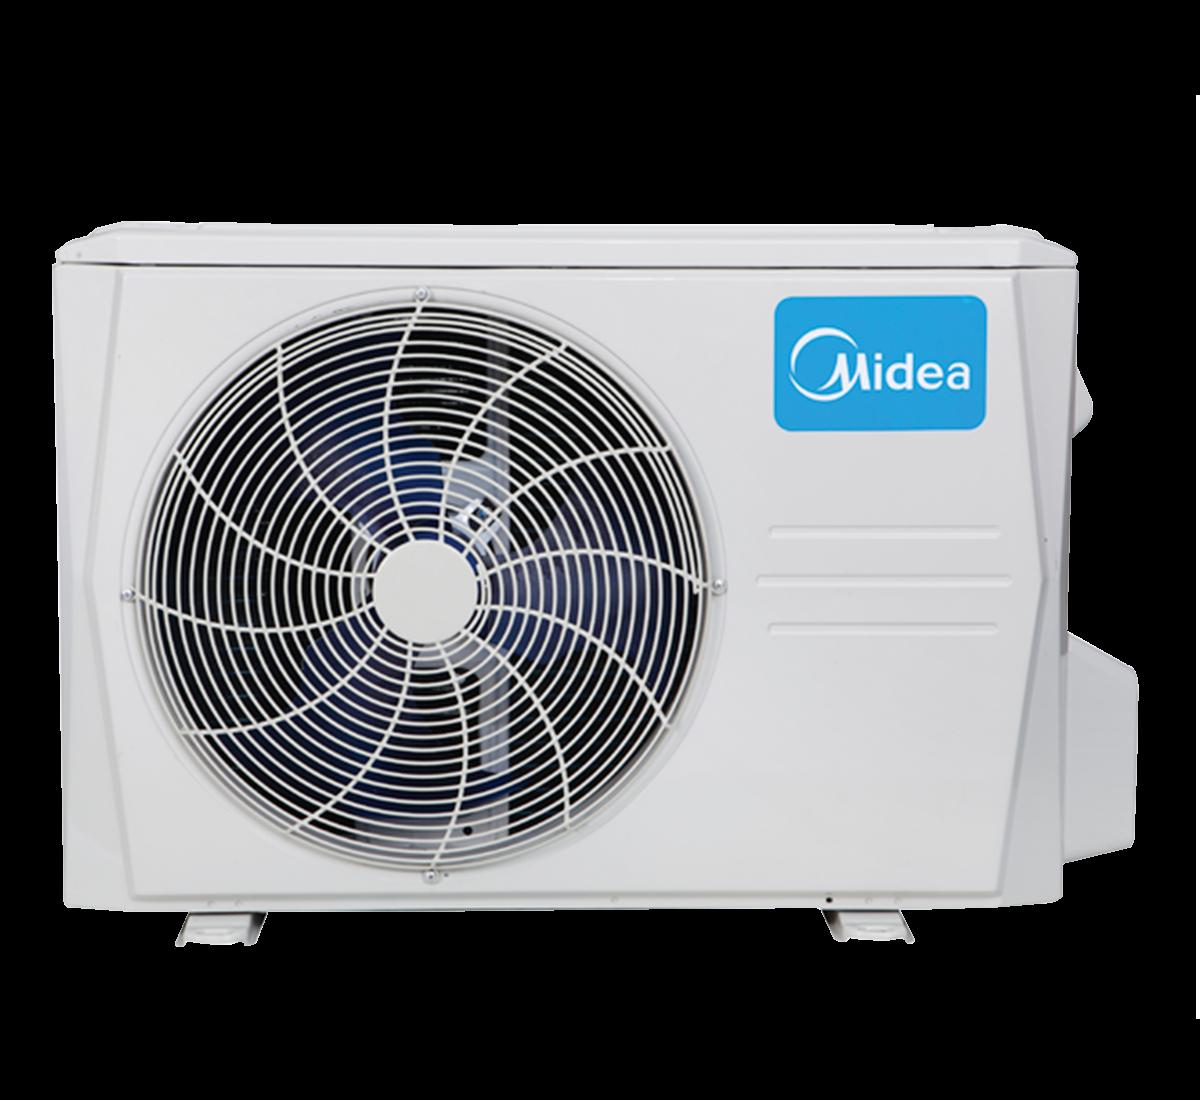 aire acondicionado unidad exterior midea inverter mob01 09hfn8 qrd6gw modelo vertu plus 26 09 n8 instalacion incluida caseragua